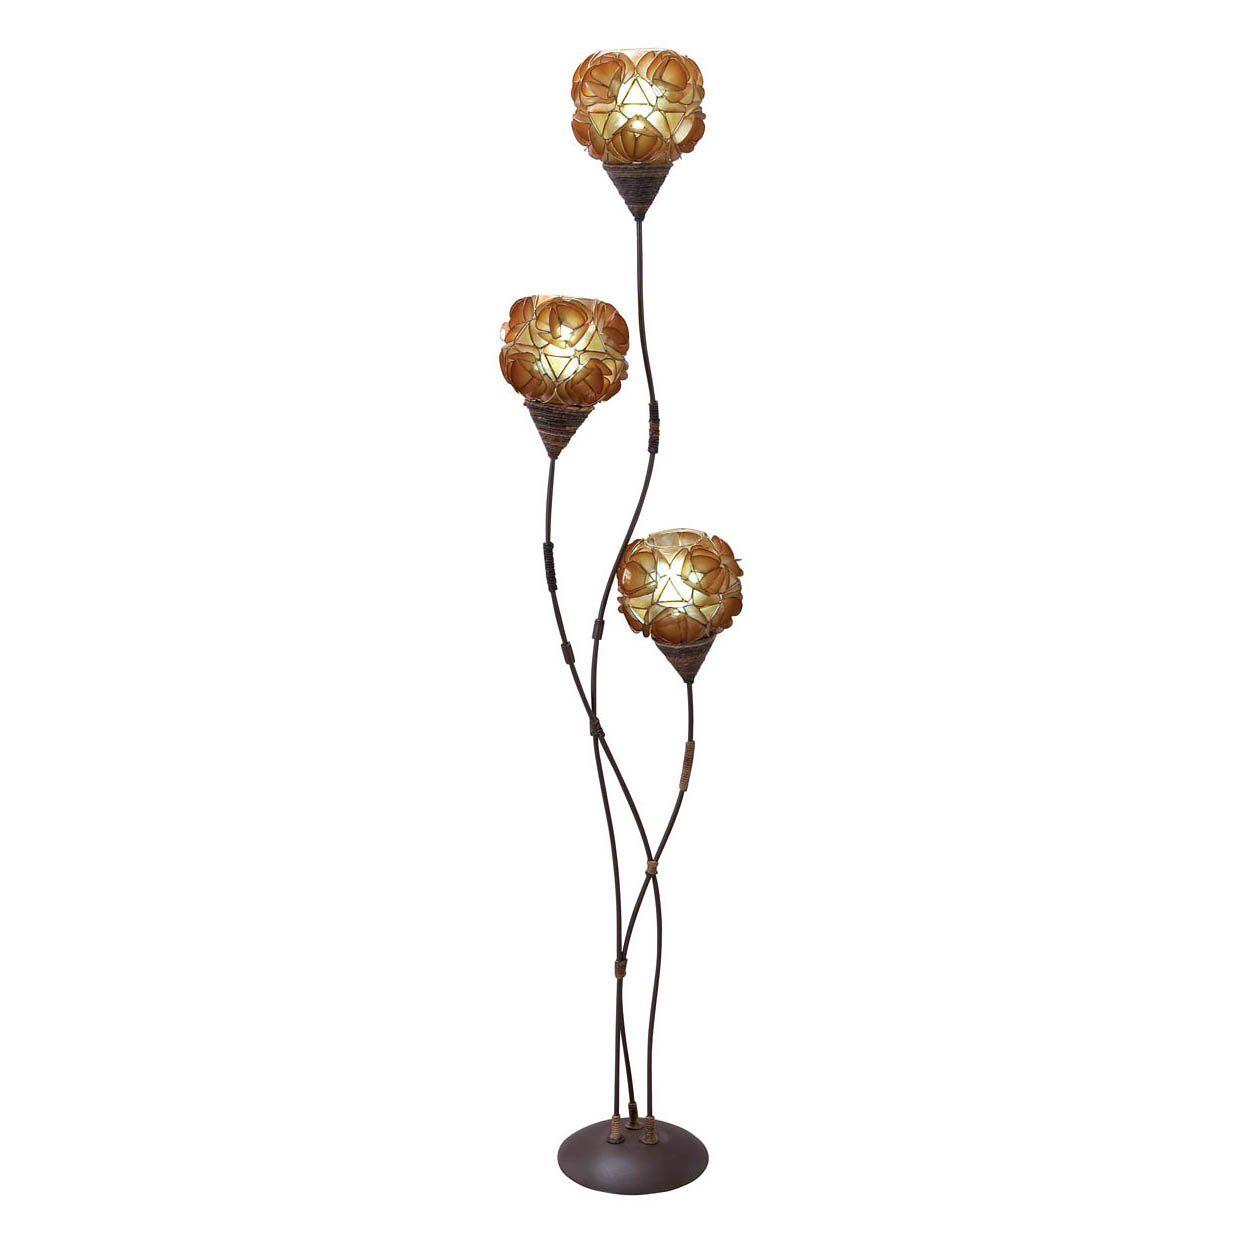 Aspire Home Accents 67639 Cascara Triple Bulb Floor Lamp Lighting Universe Floral Floor Lamp Floor Lamp Torchiere Floor Lamp